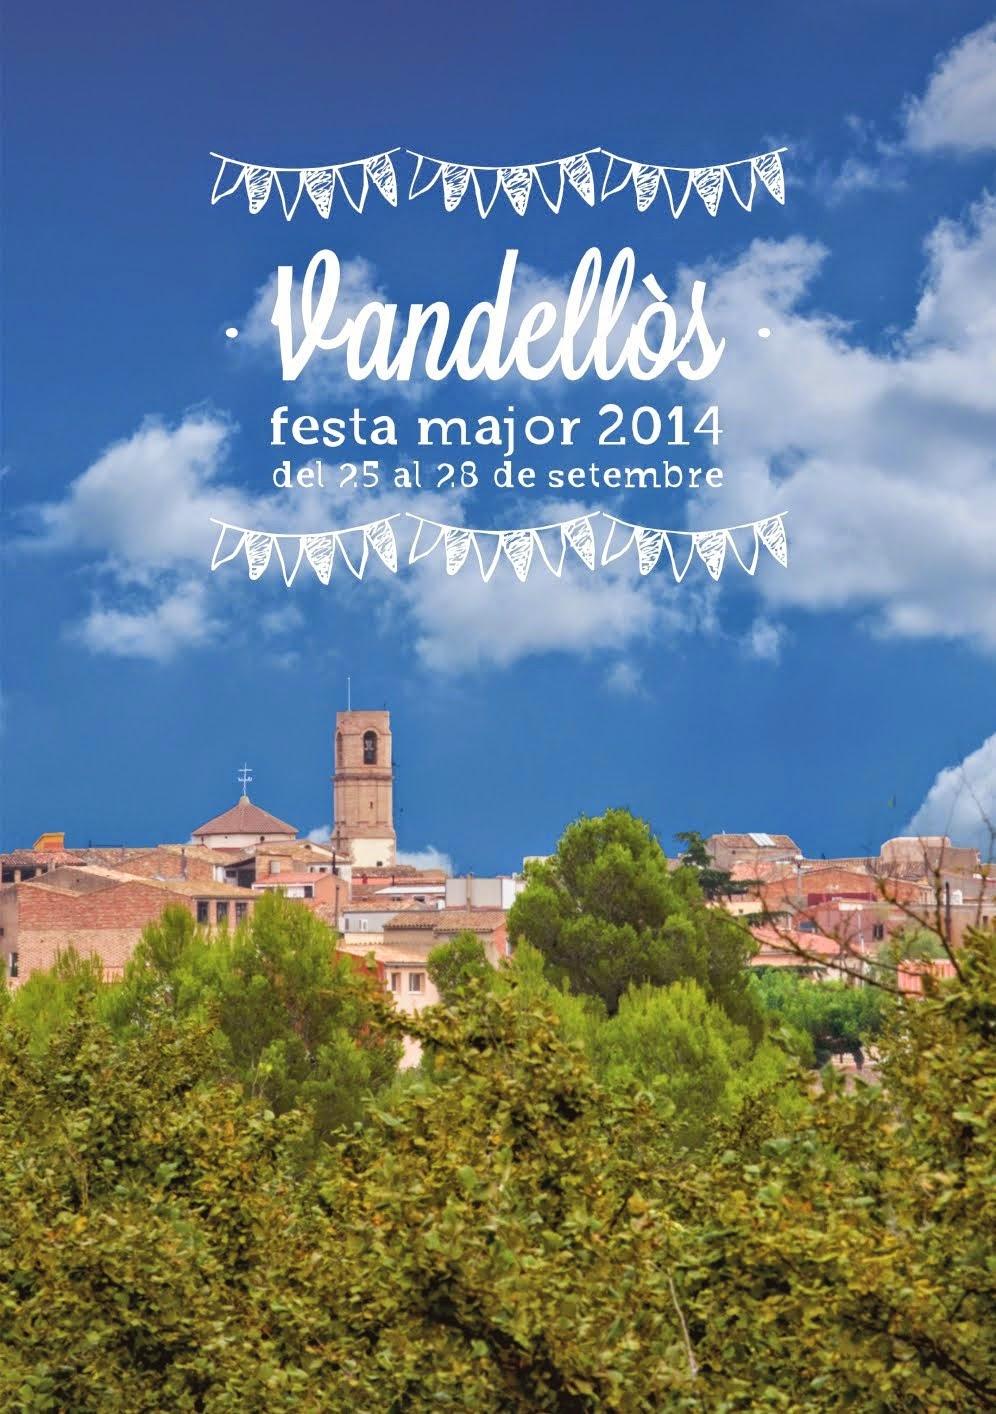 FESTA MAJOR DE VANDELLÒS 2014